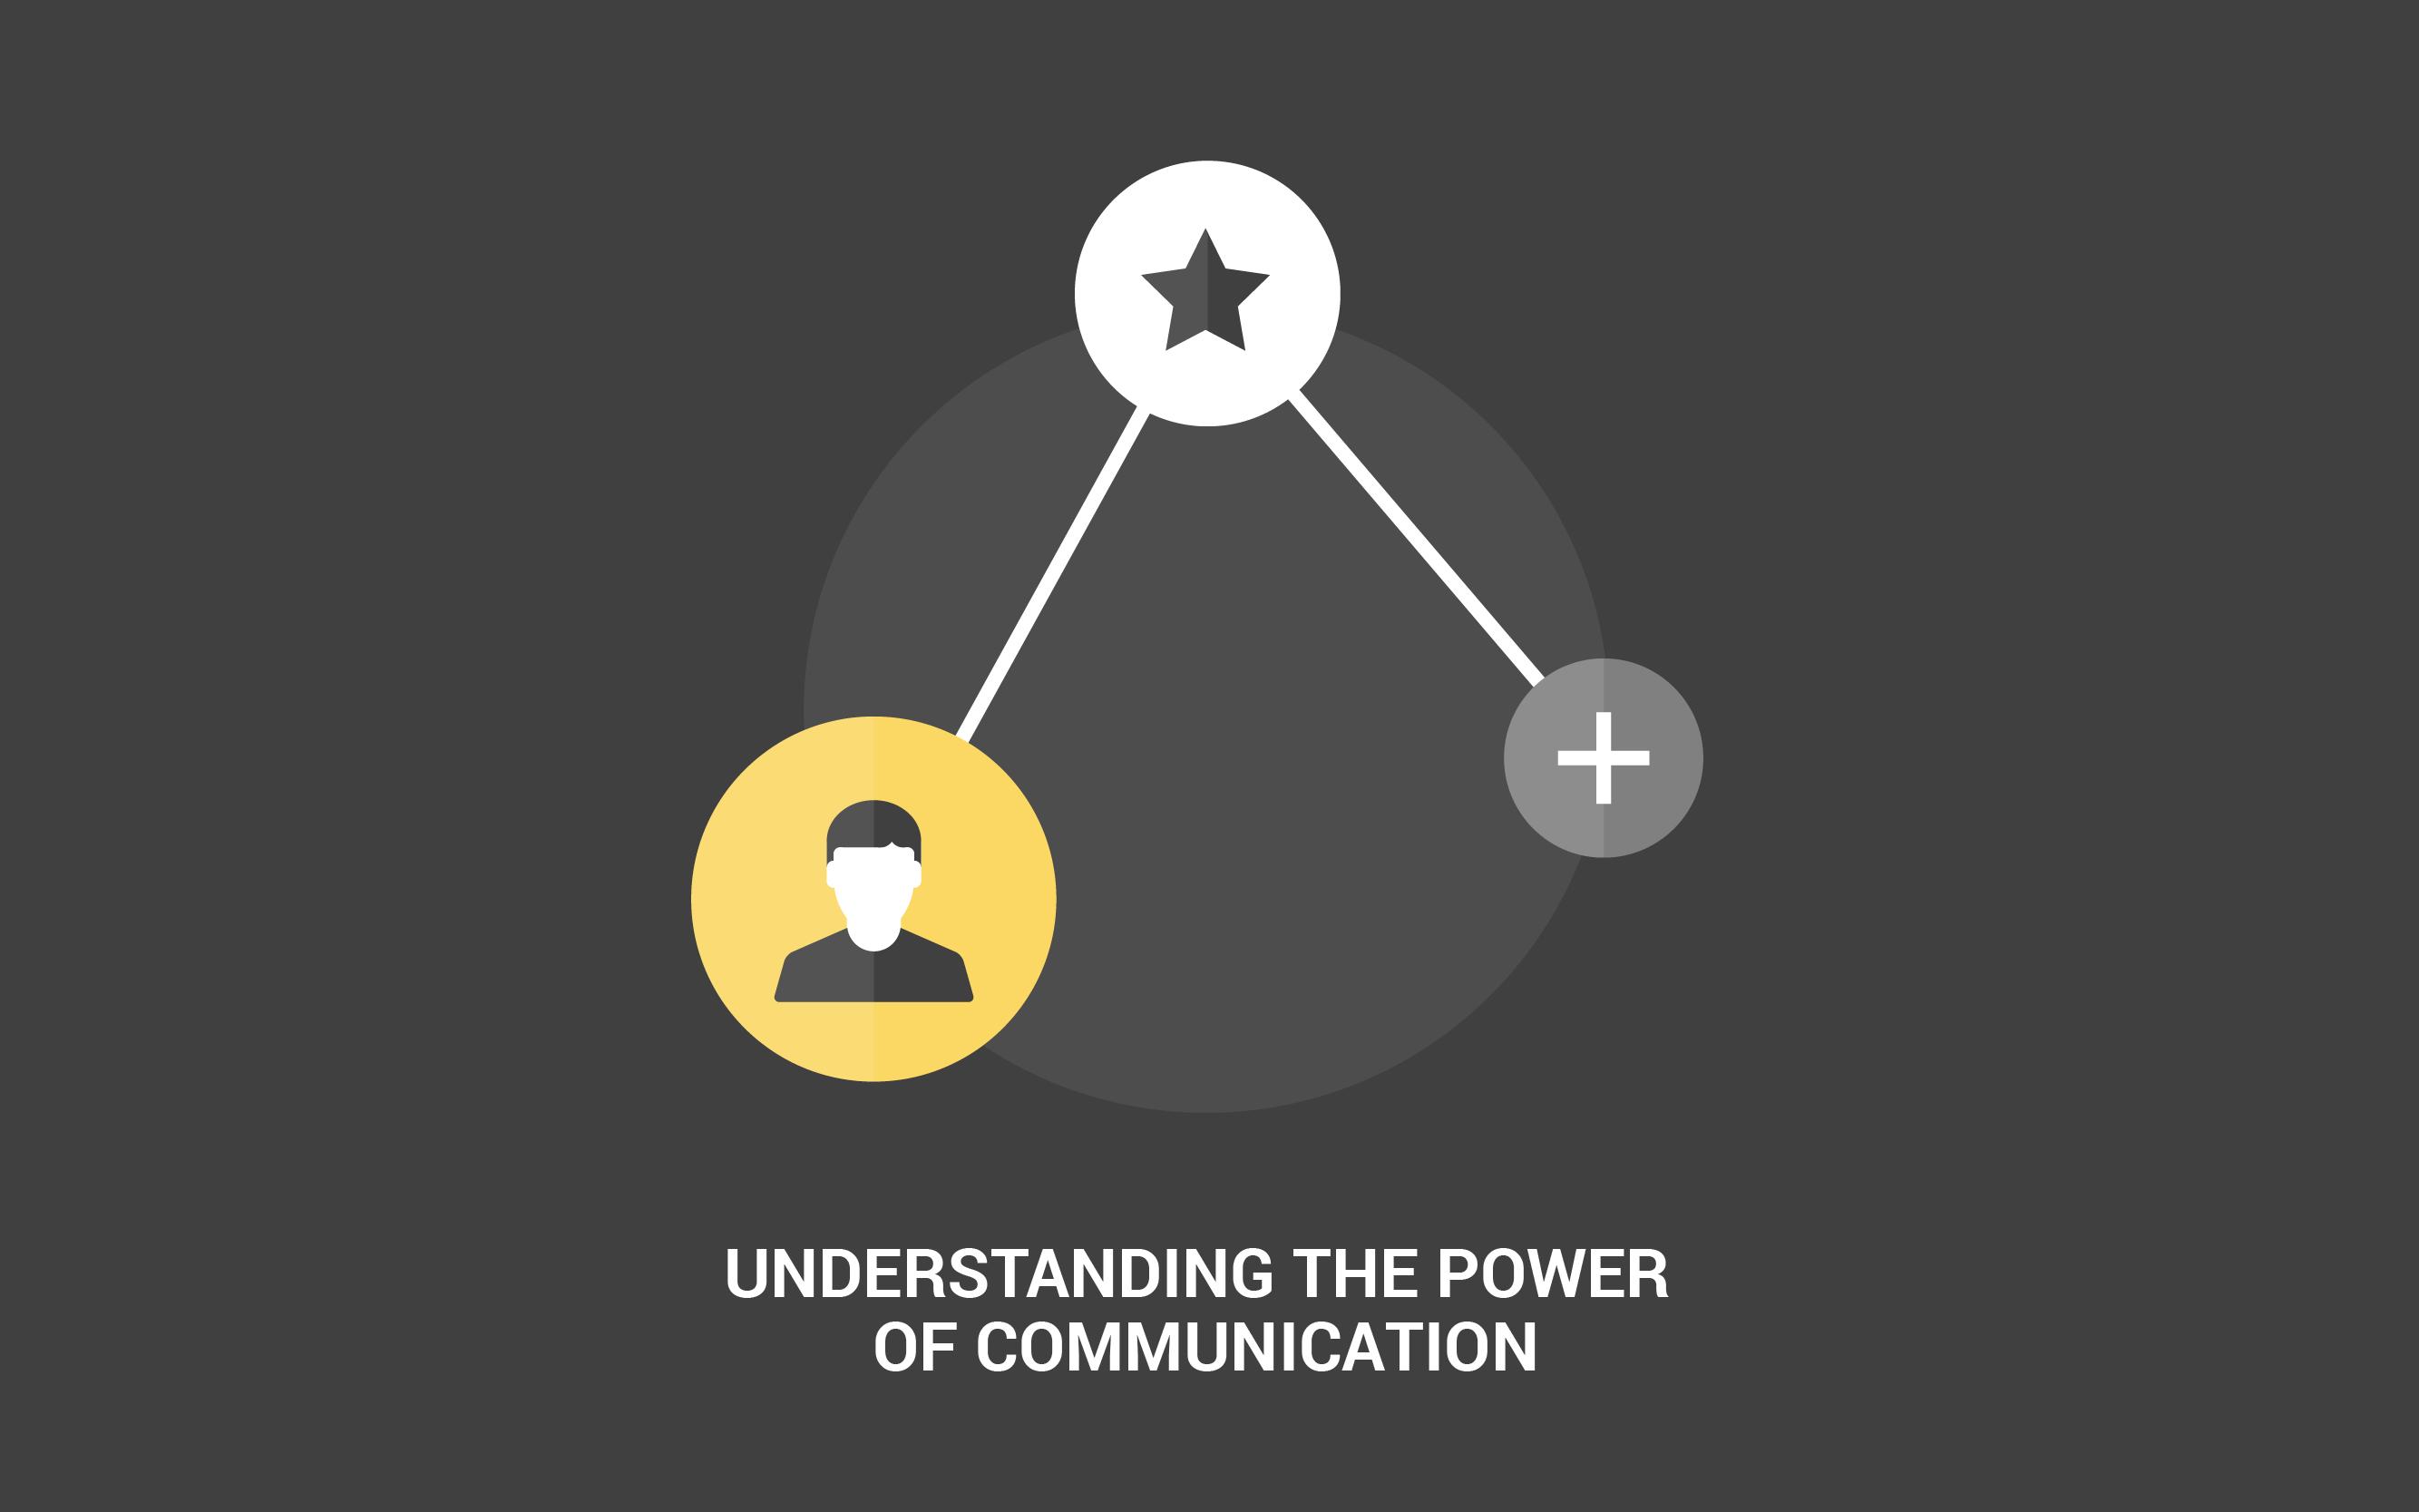 Understanding the Power of Communication